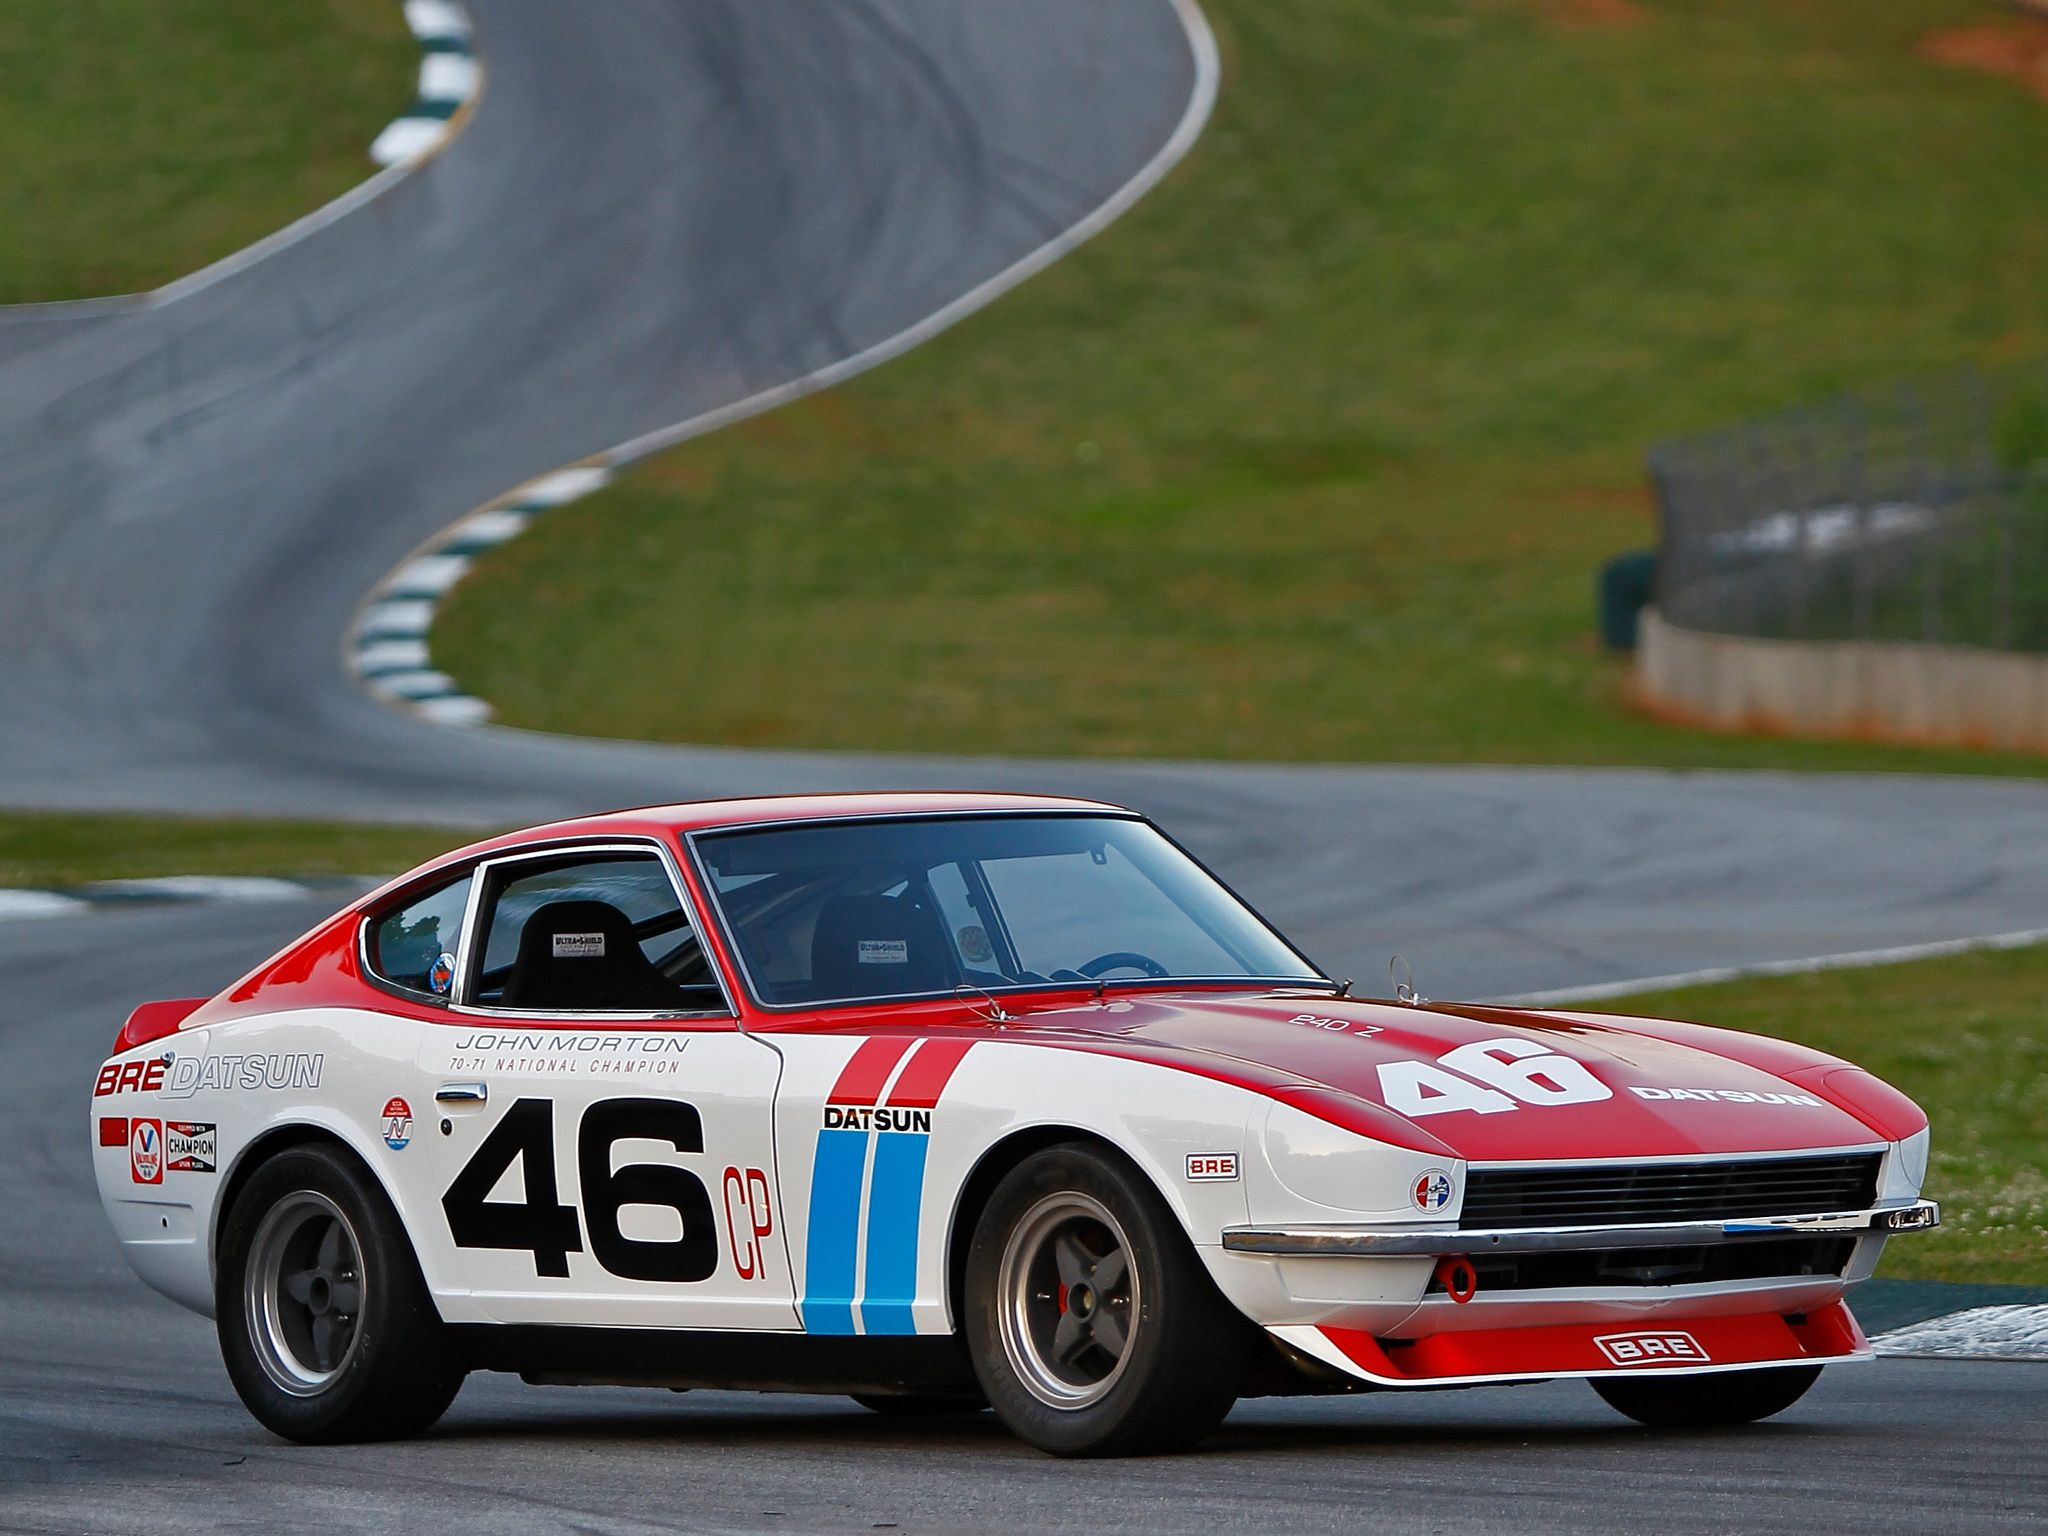 Datsun 240Z SCCA C Production National Championship race car